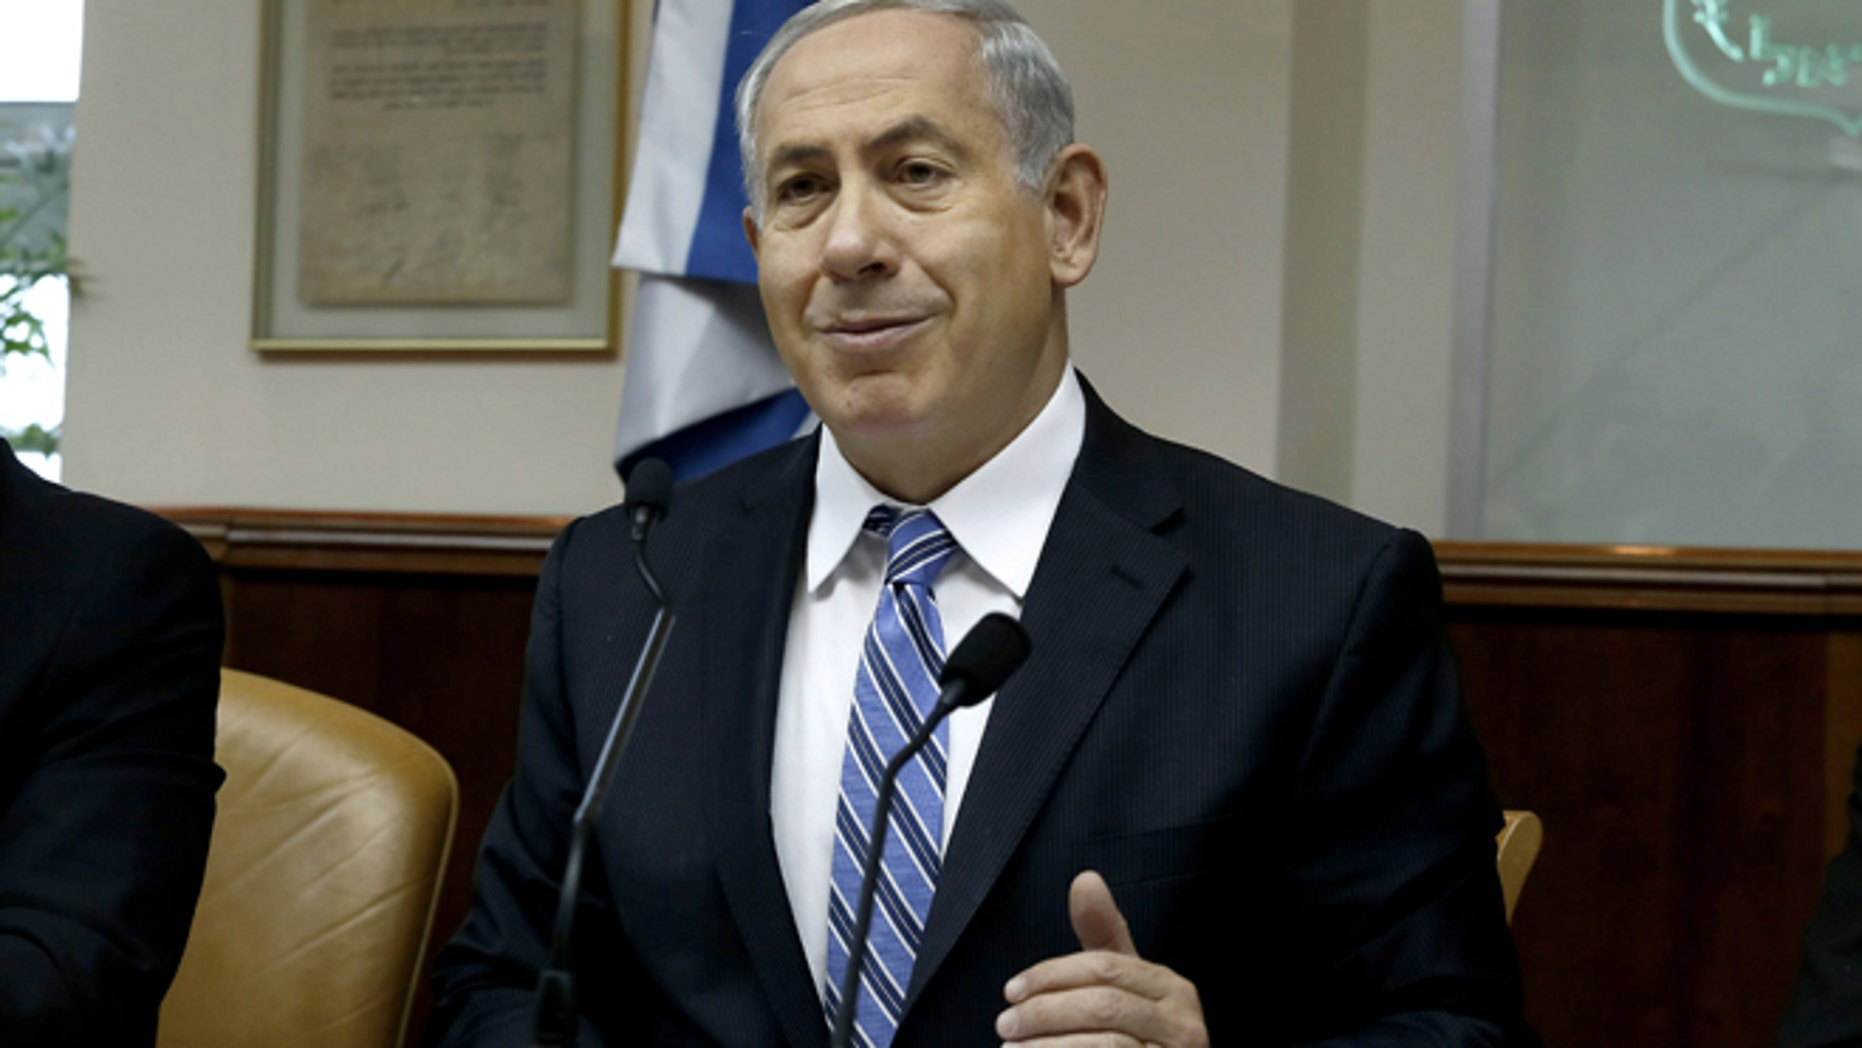 Feb. 2, 2014: Israeli Prime Minister Benjamin Netanyahu chairs the weekly cabinet meeting in Jerusalem.